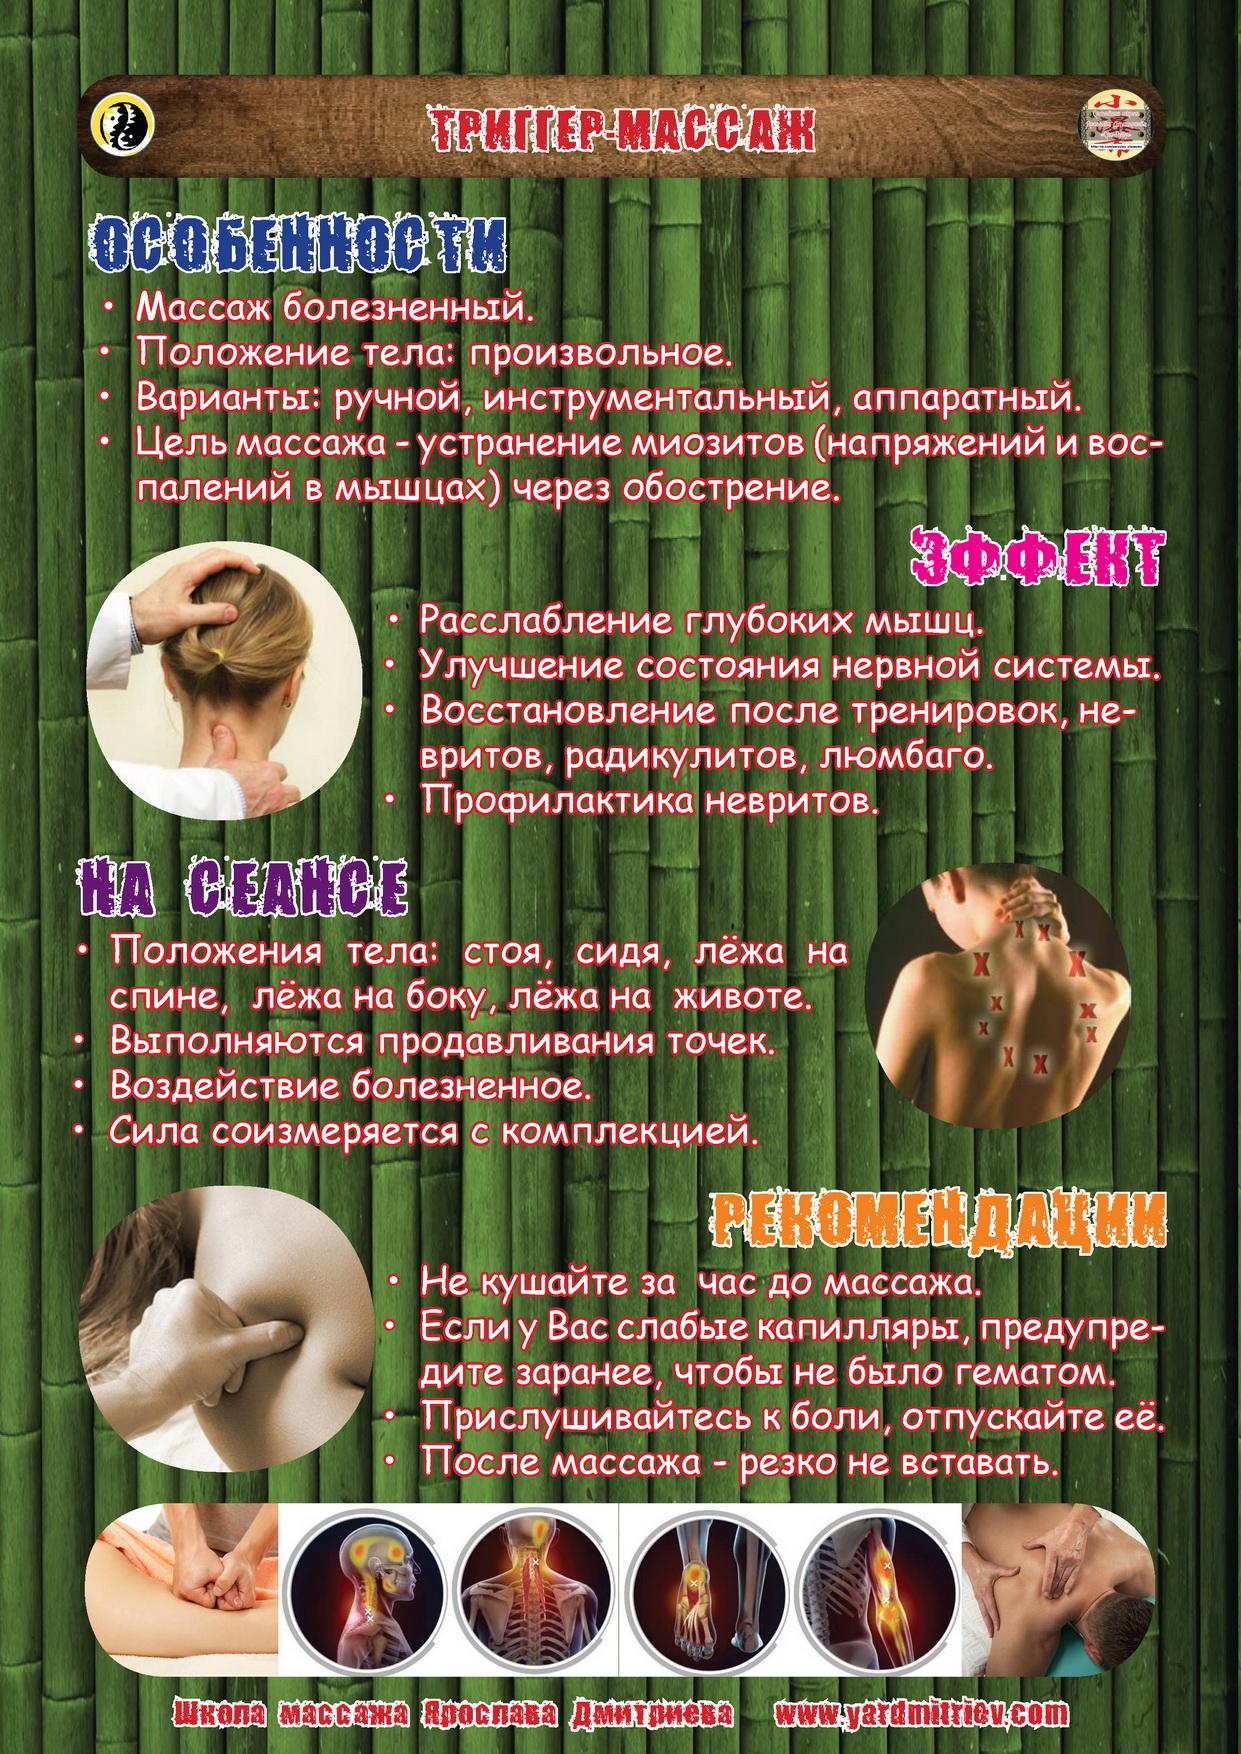 Точечный массаж (триггер-массаж)